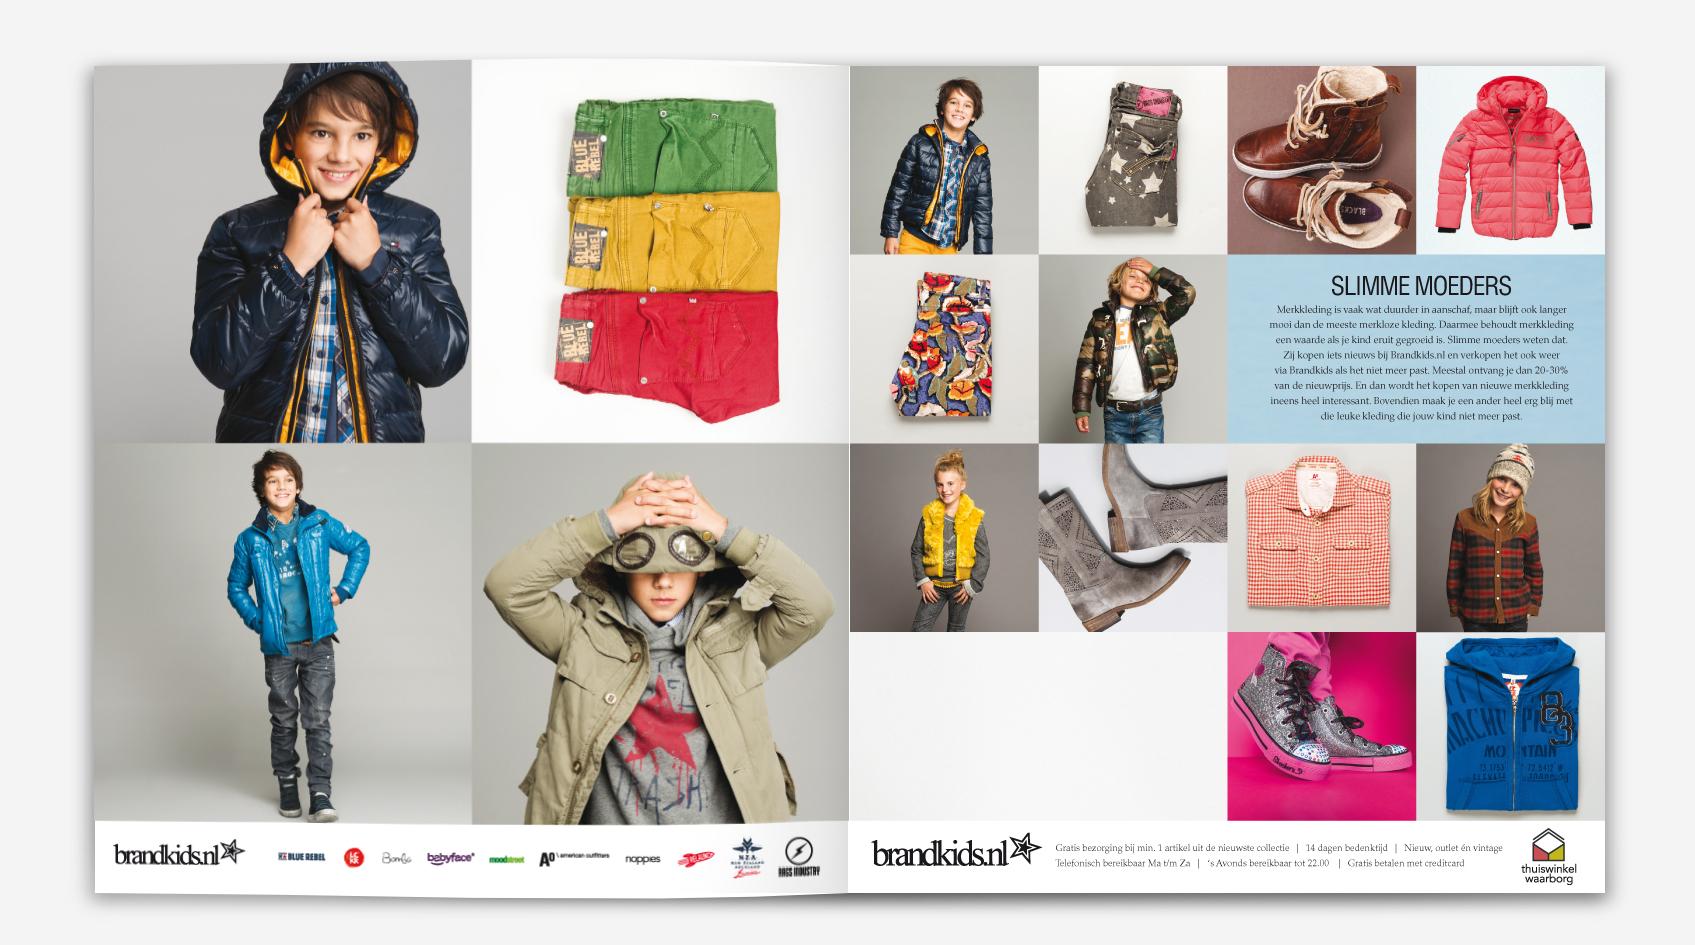 rene_koster_brandkids_magazine_01.jpg